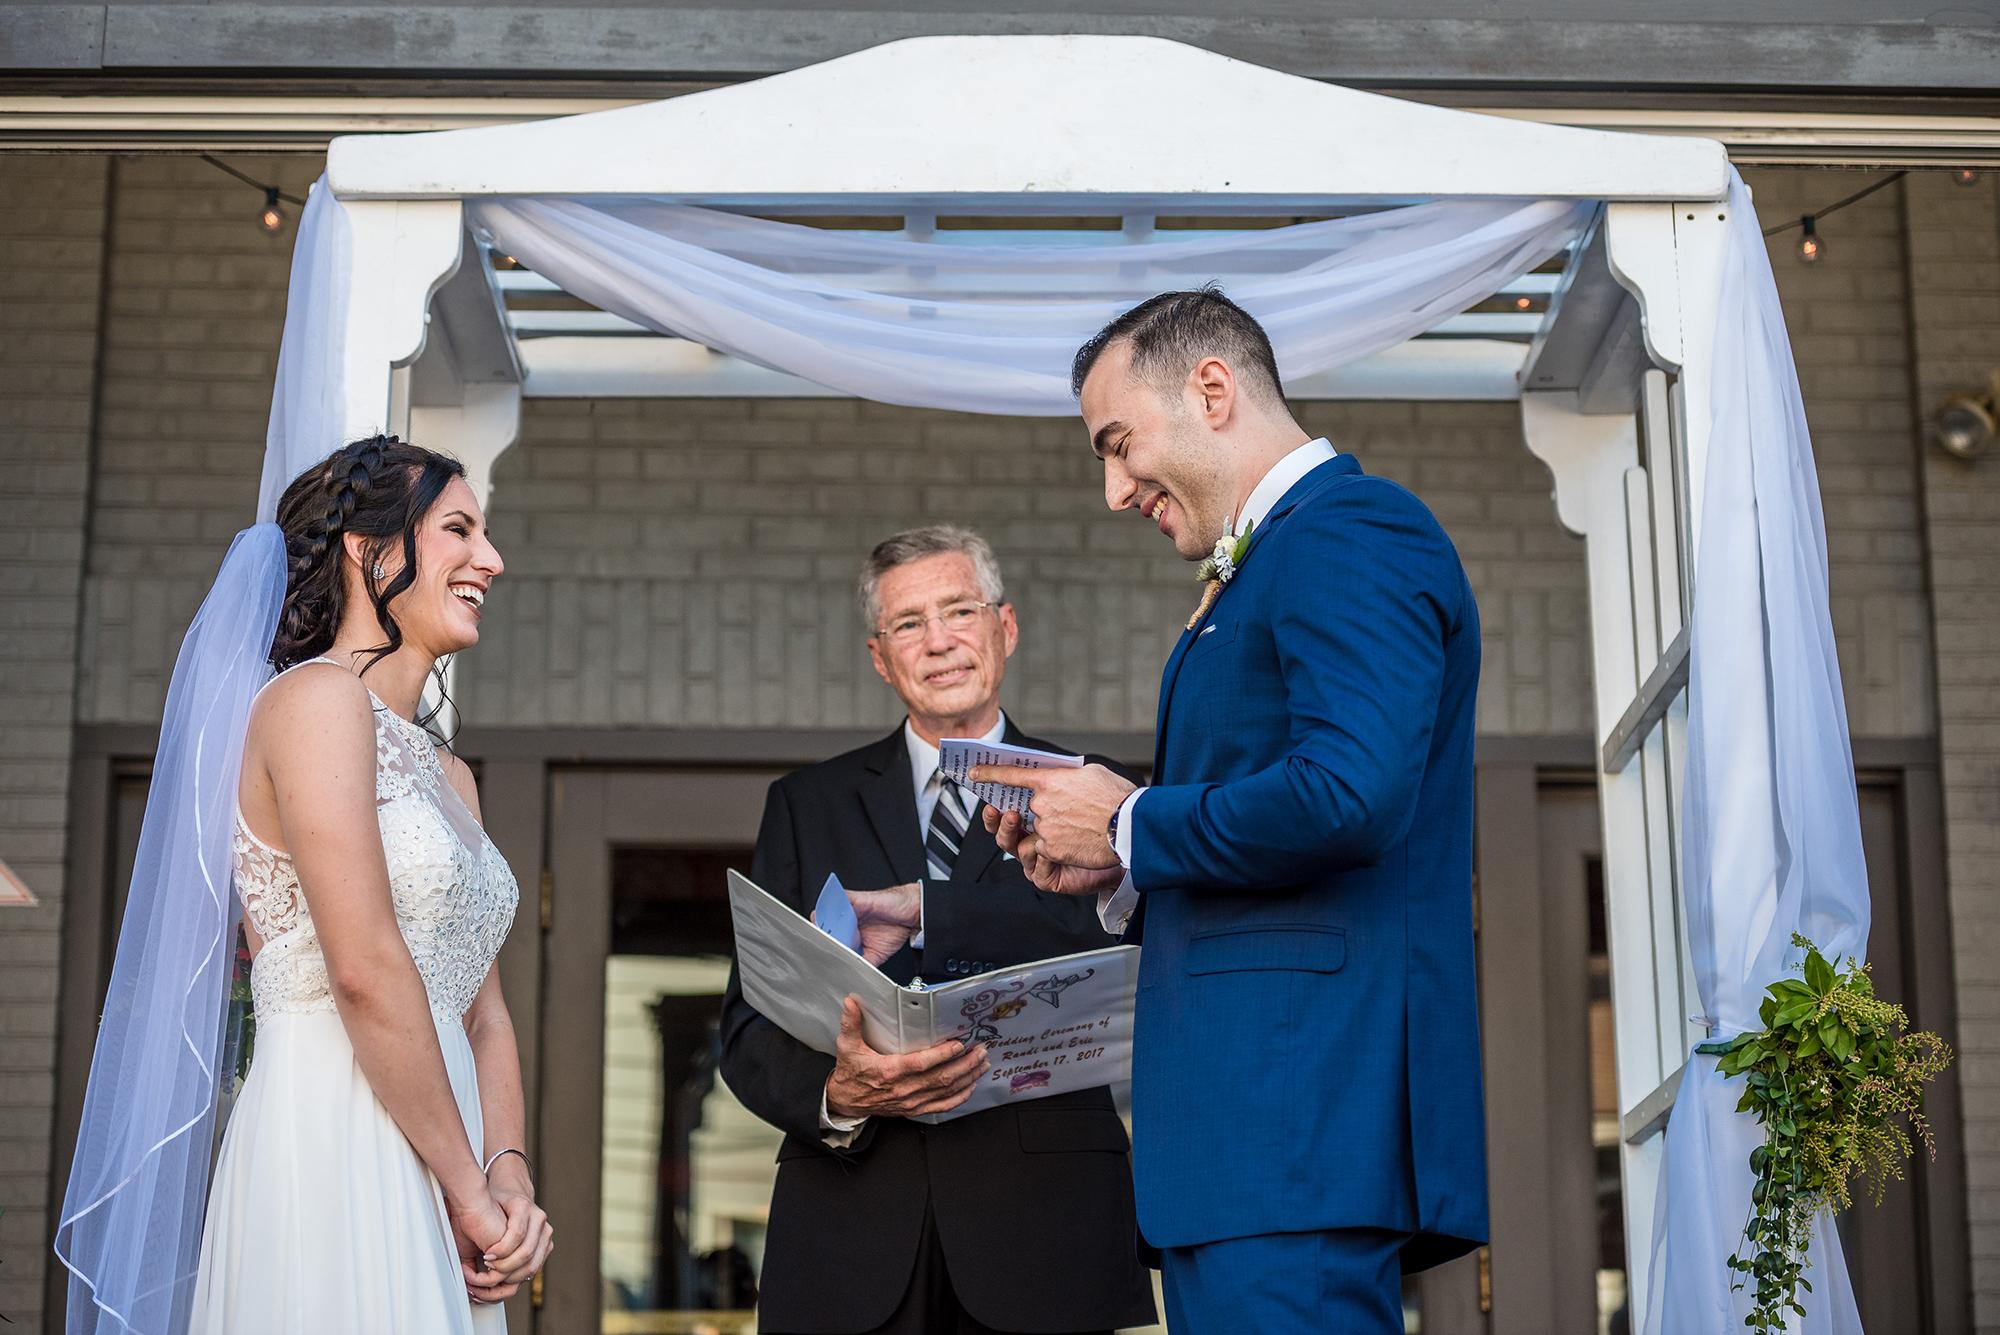 trenos-wedding-lbi-photographer-28.jpg